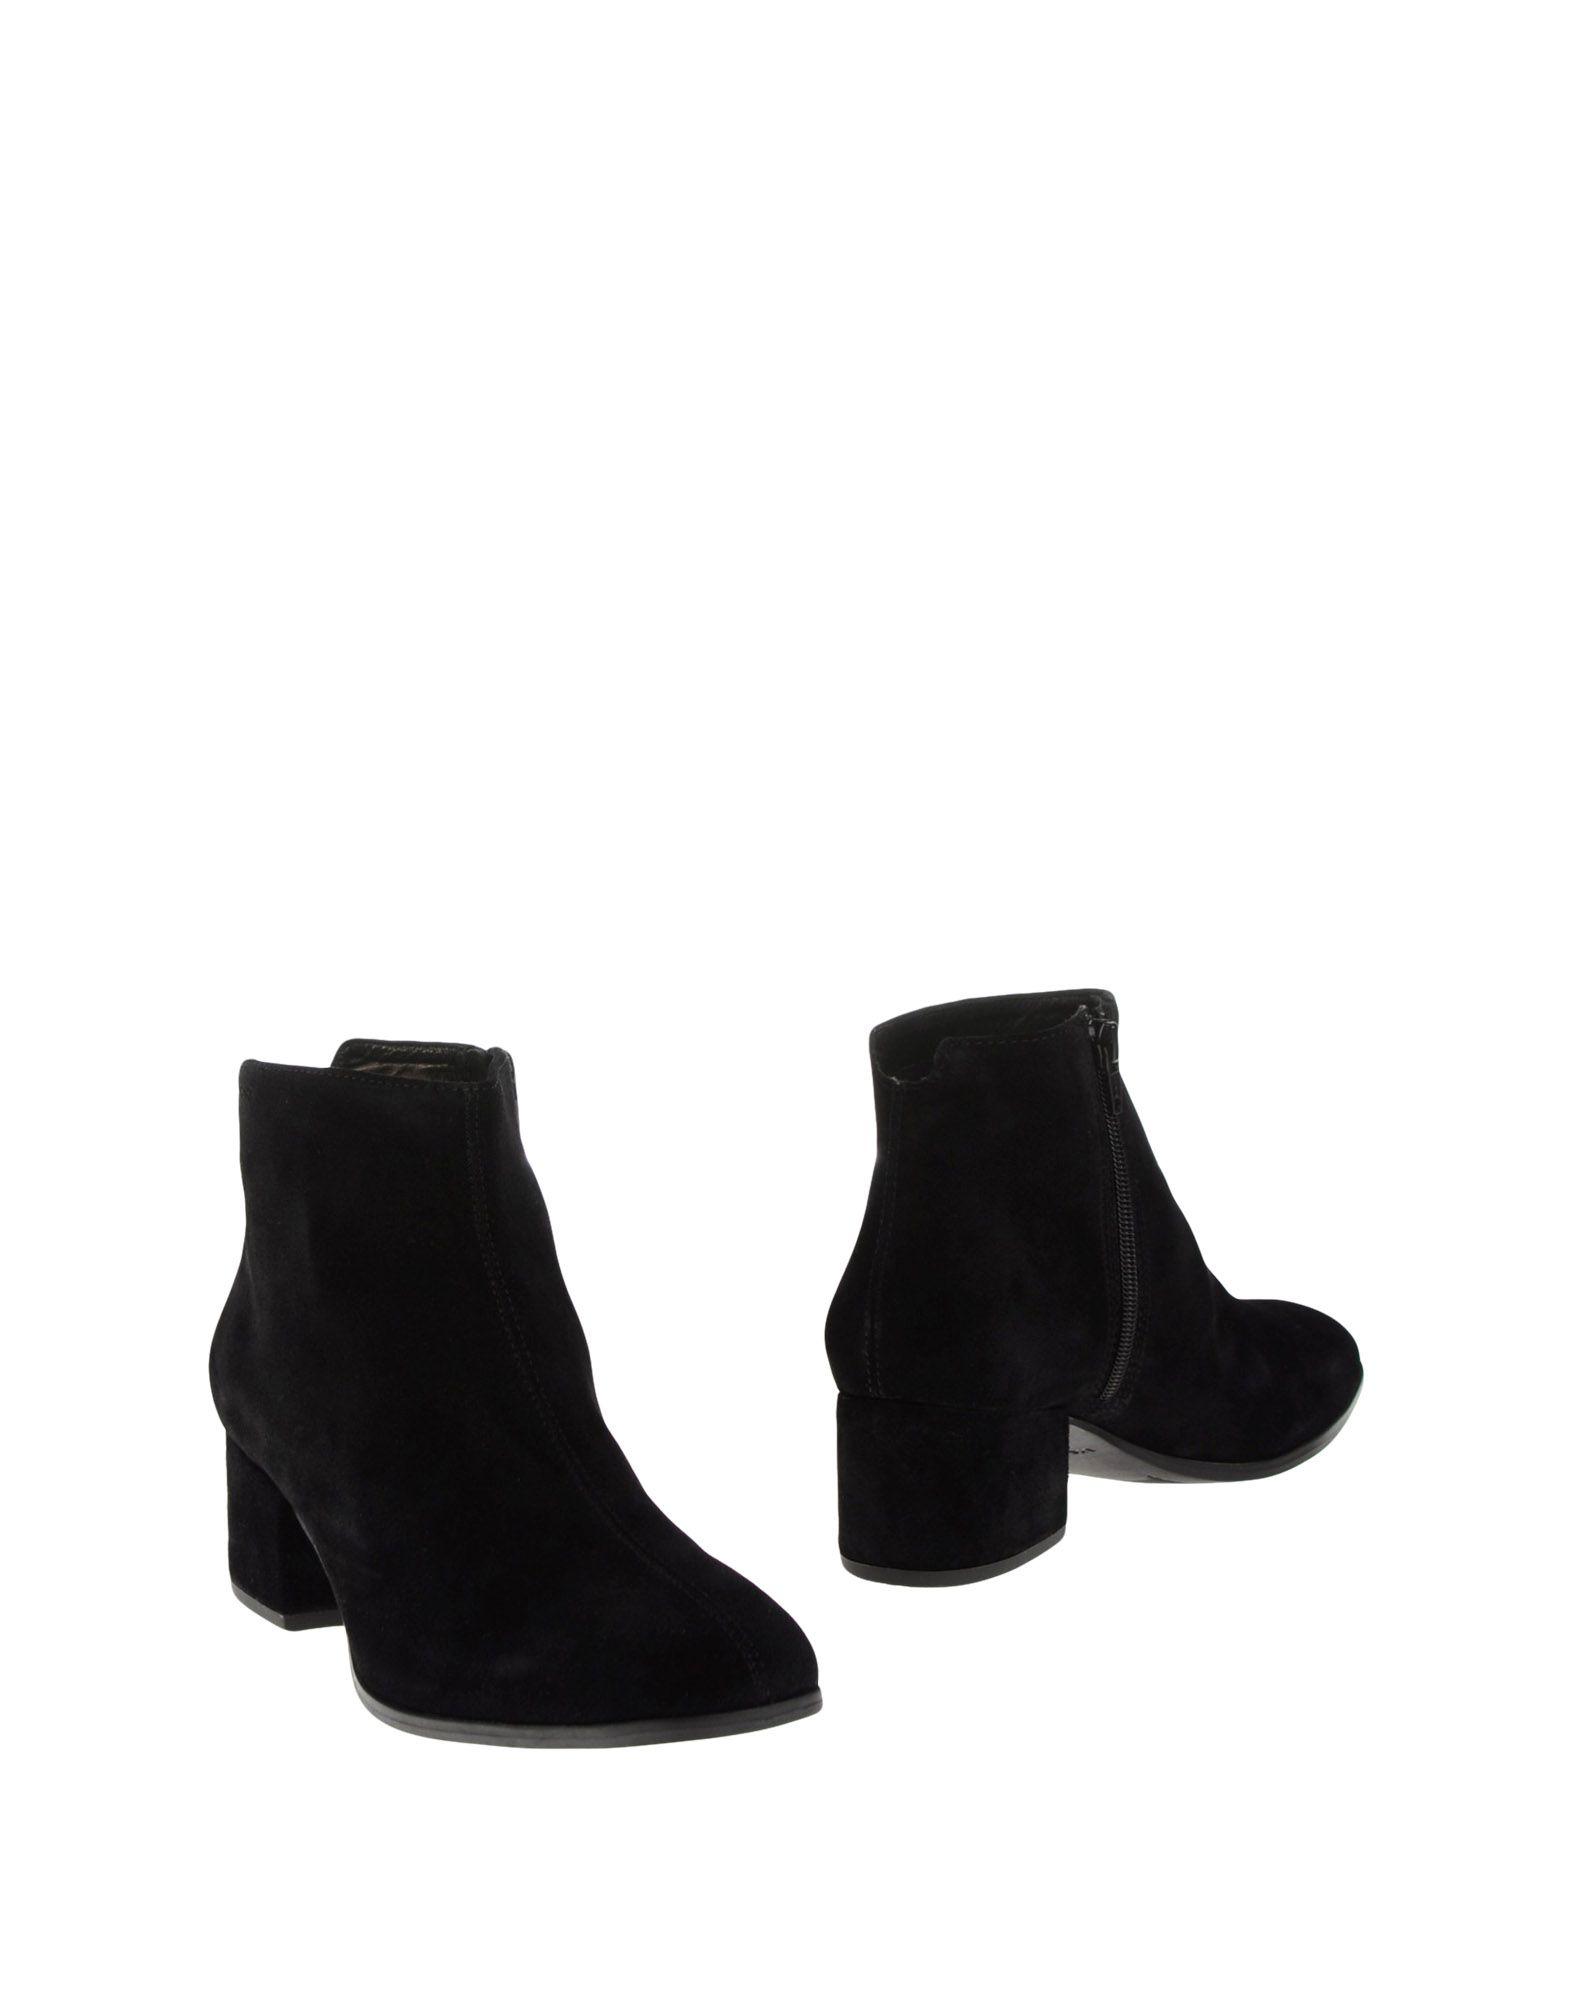 Vagabond Shoemakers Stiefelette Damen  Schuhe 11239439GT Gute Qualität beliebte Schuhe  b4c4a2